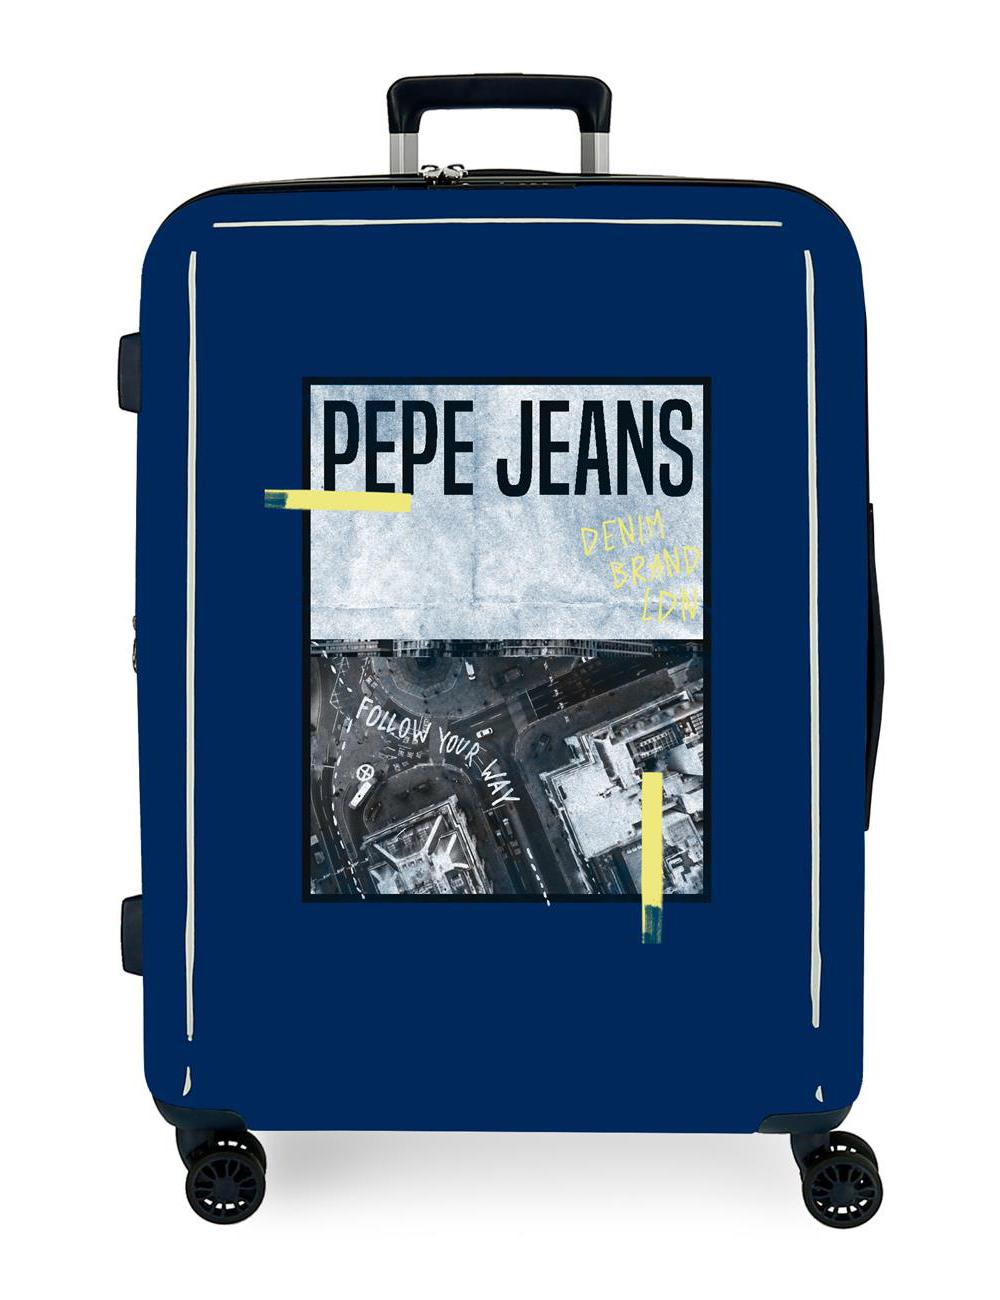 7929328 Maleta Cabina Pepe Jeans Nolan Crispin Denim